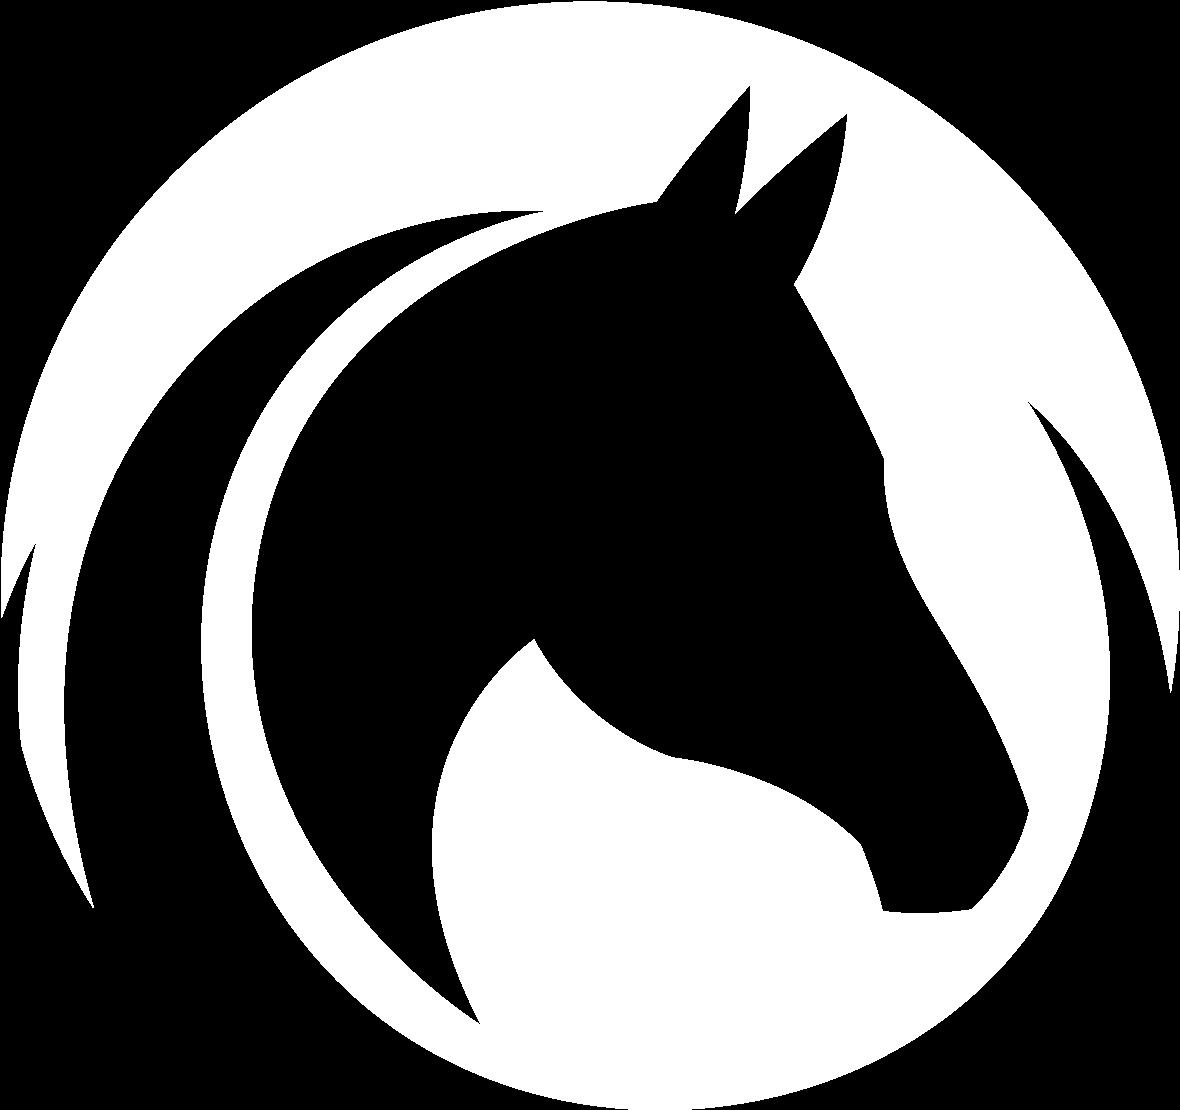 Transparent equine clip art - Avanti Equine Veterinary Partners - Horse Head Circle